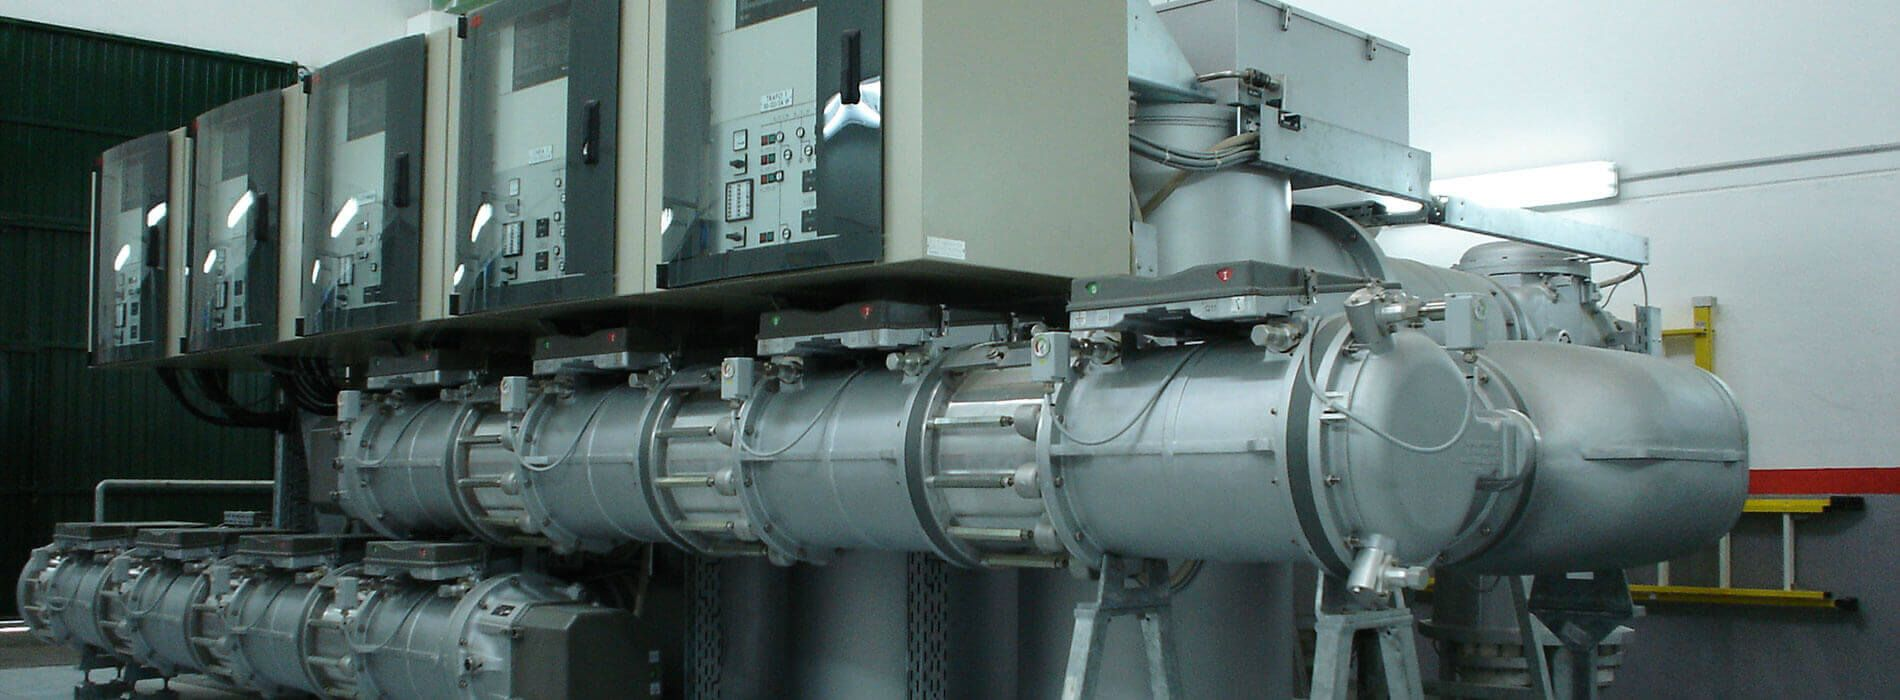 Ingeniería electromecánica en Asturias